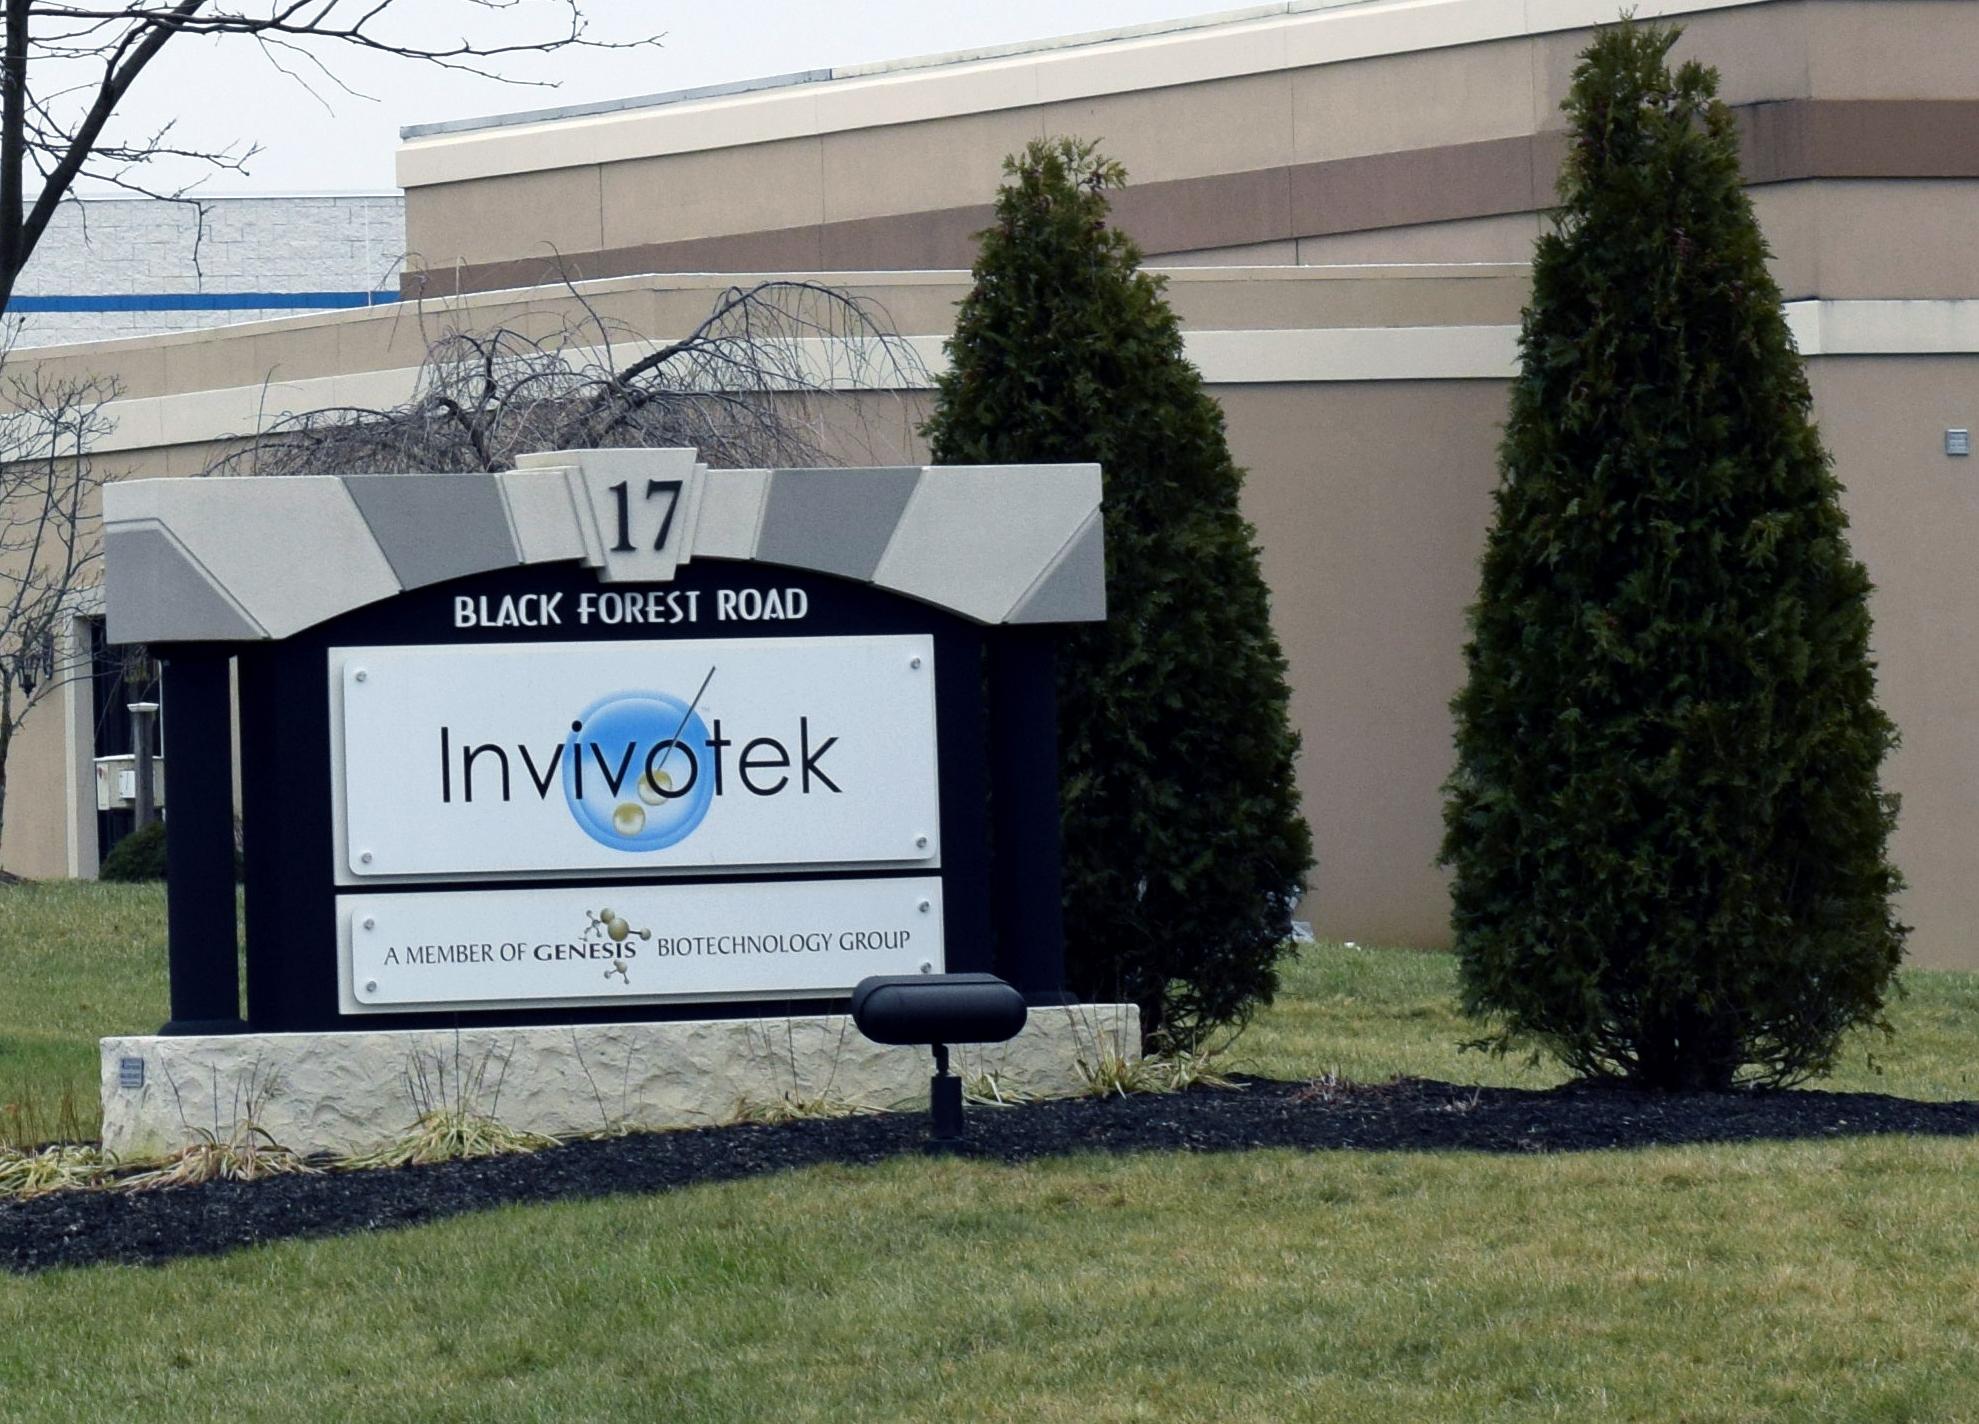 Invivotech location web sign plant tcg tci extern.jpg